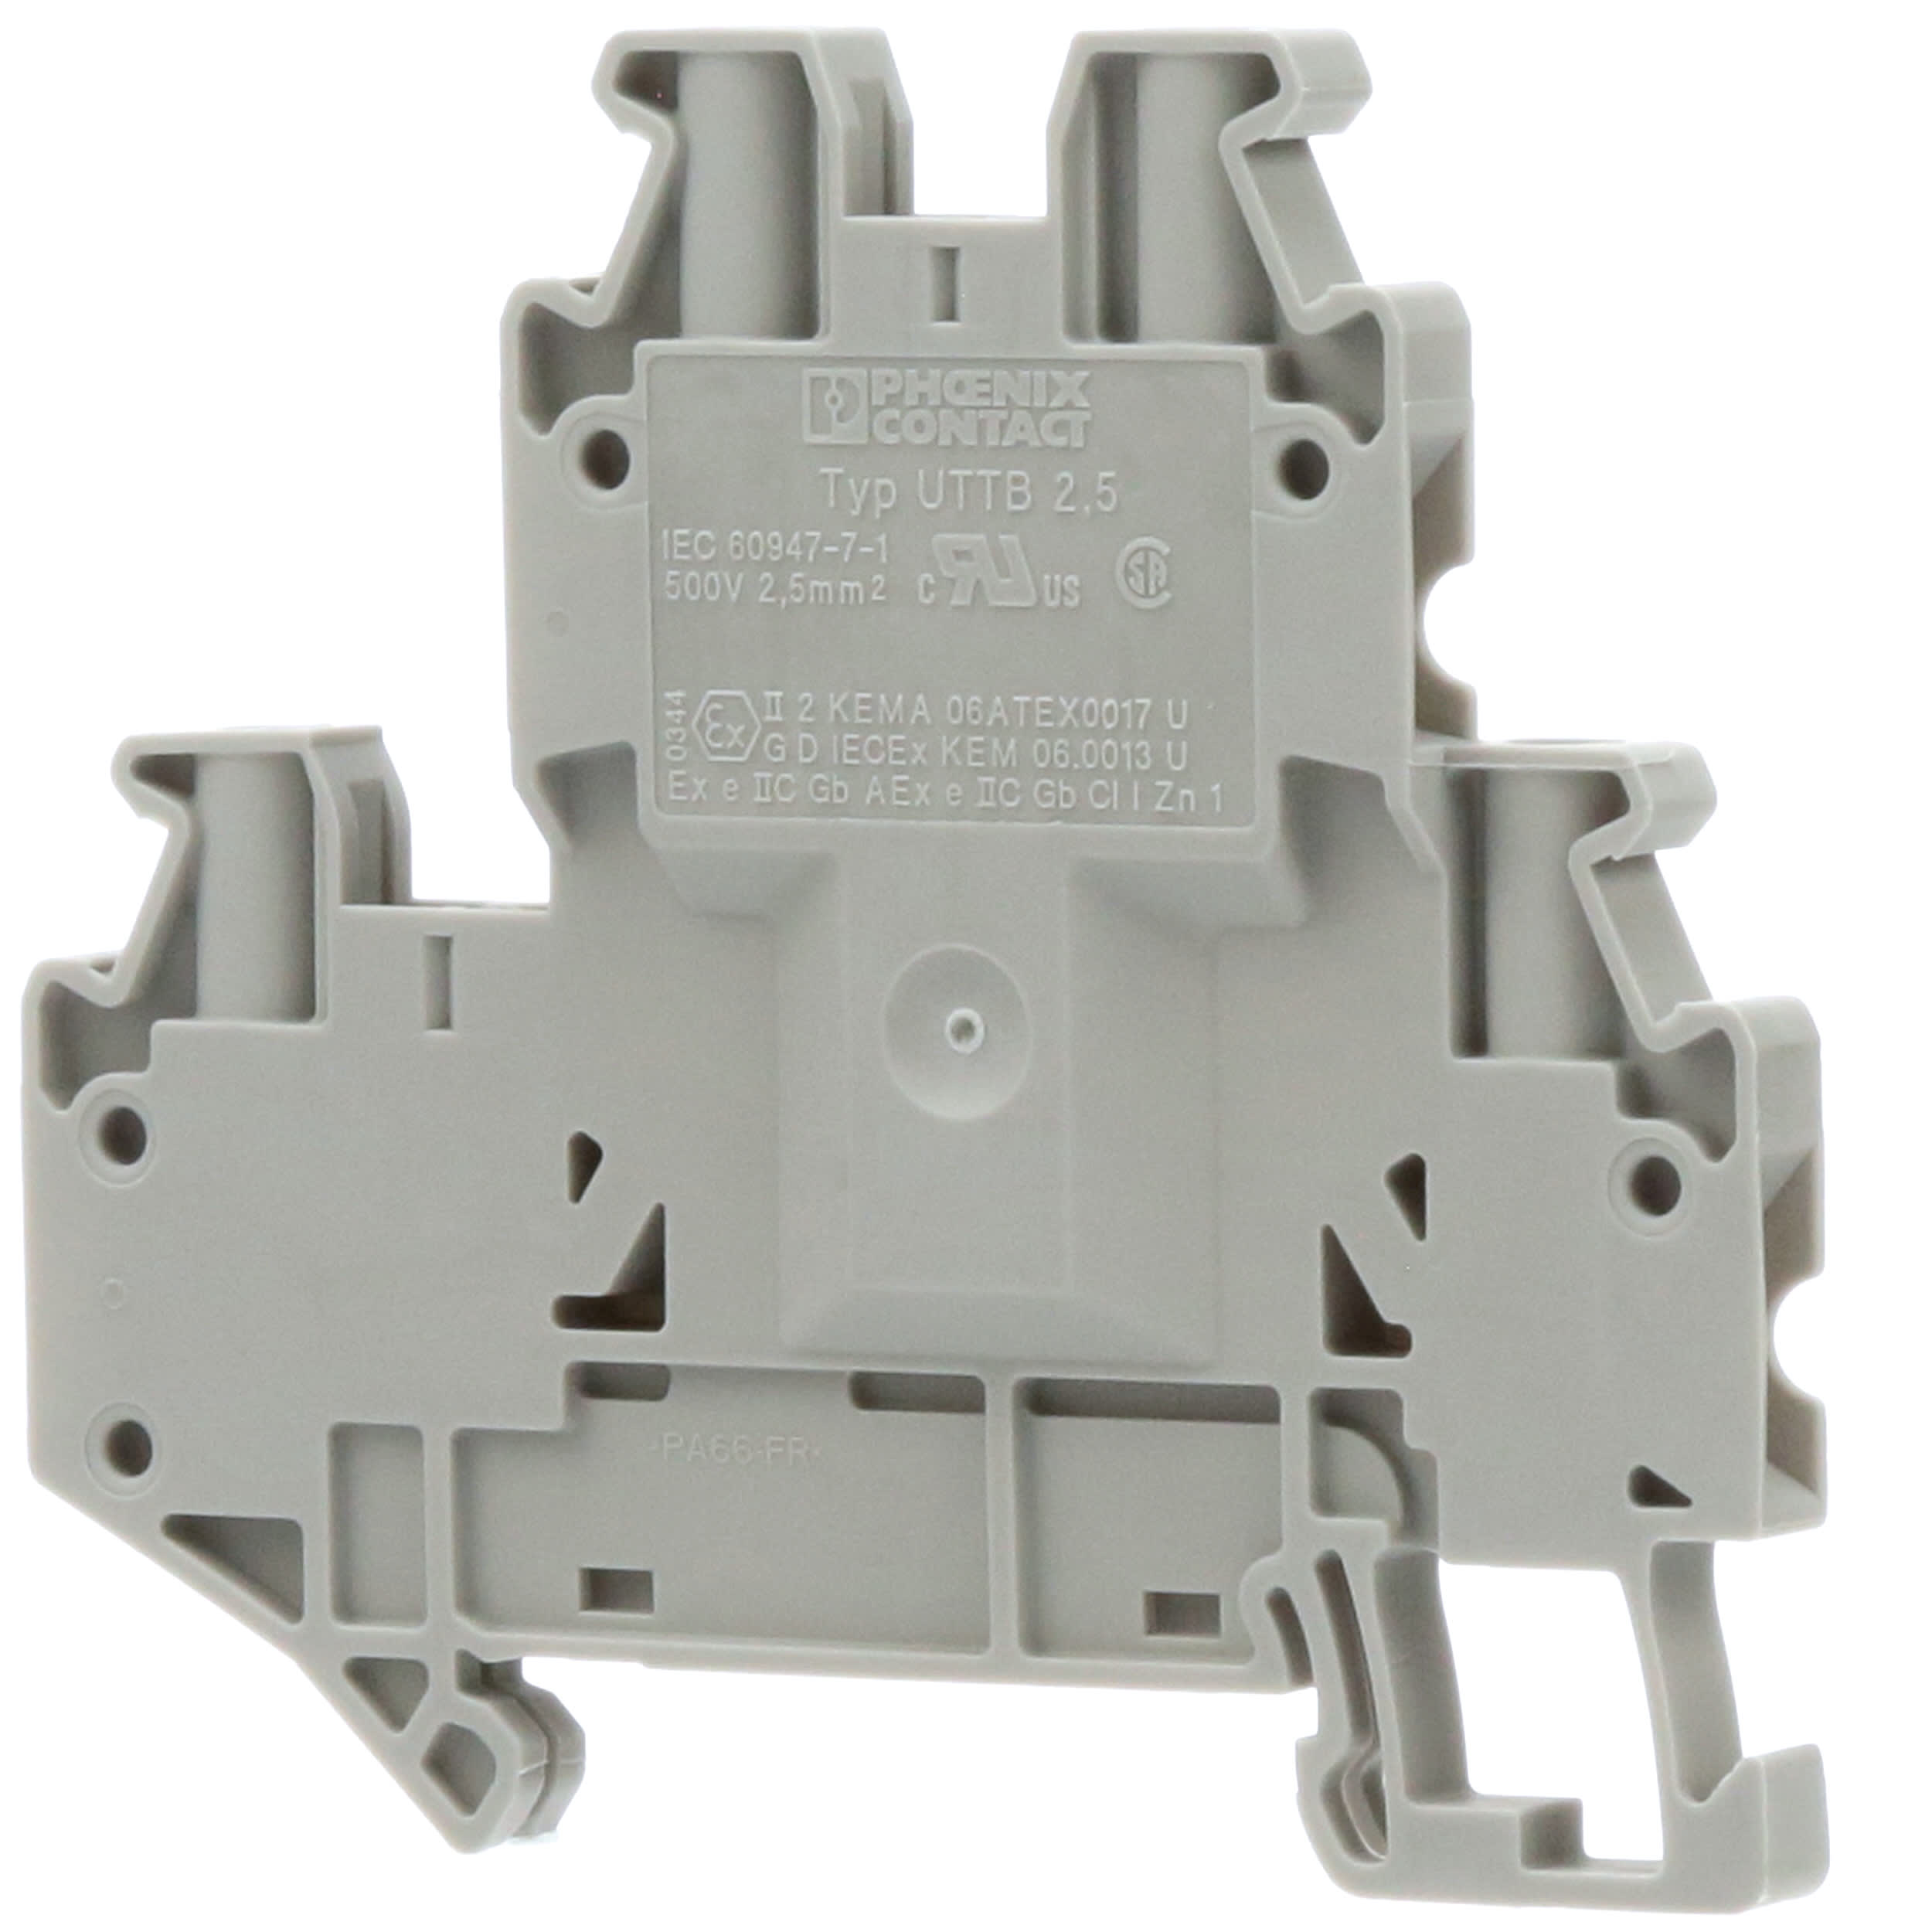 Phoenix Contact more stock-Clamp UT 2,5-3L GREY TRANSIT terminal blocks